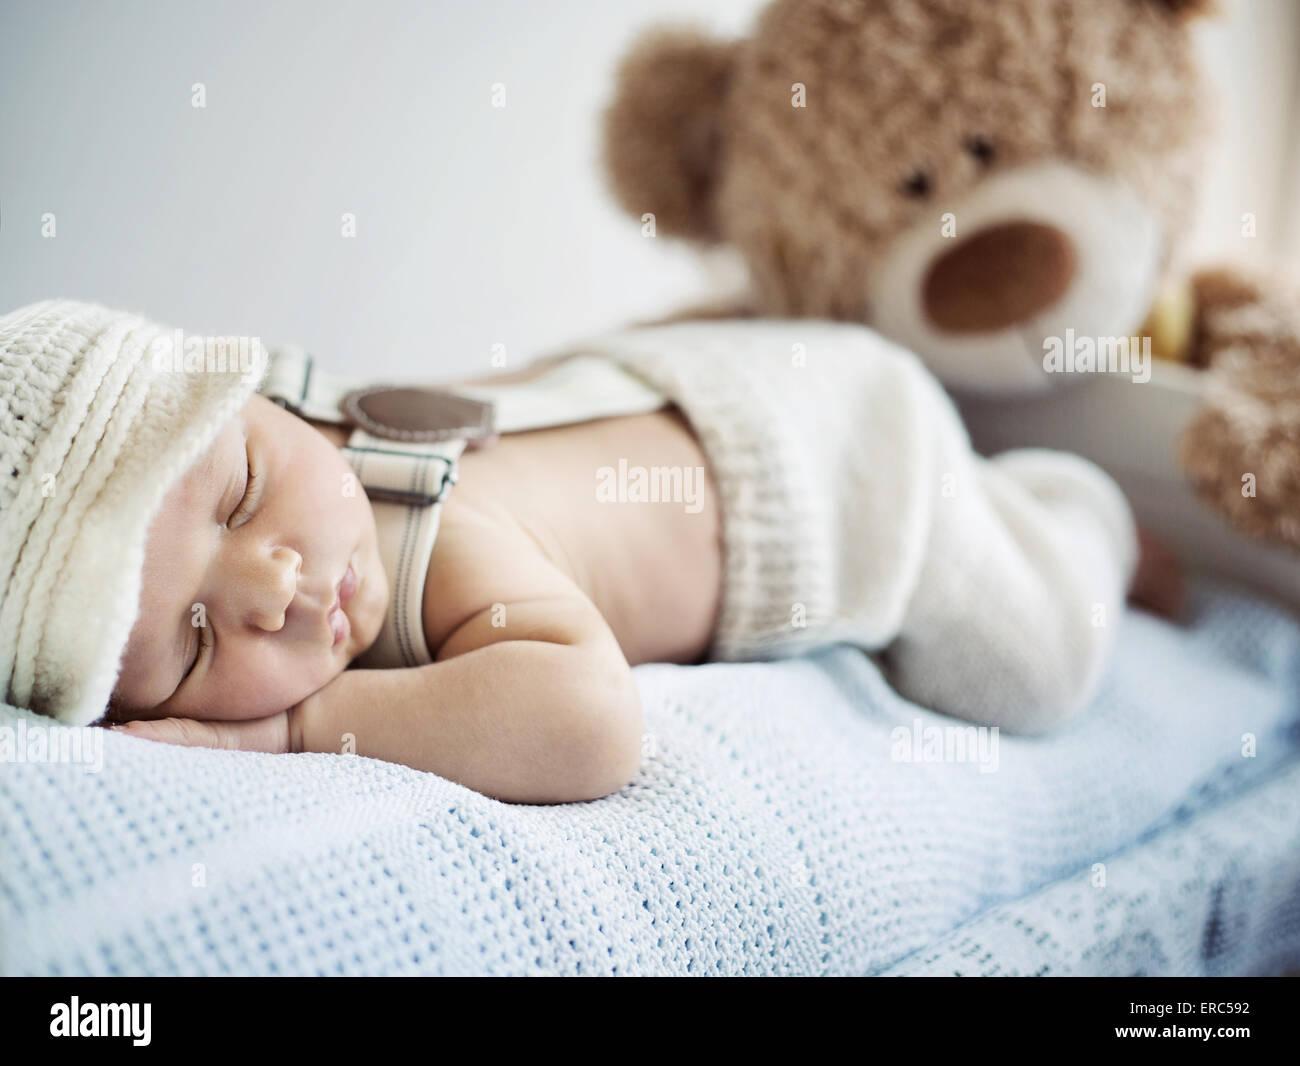 Newborn child sleeping with a teddy bear - Stock Image